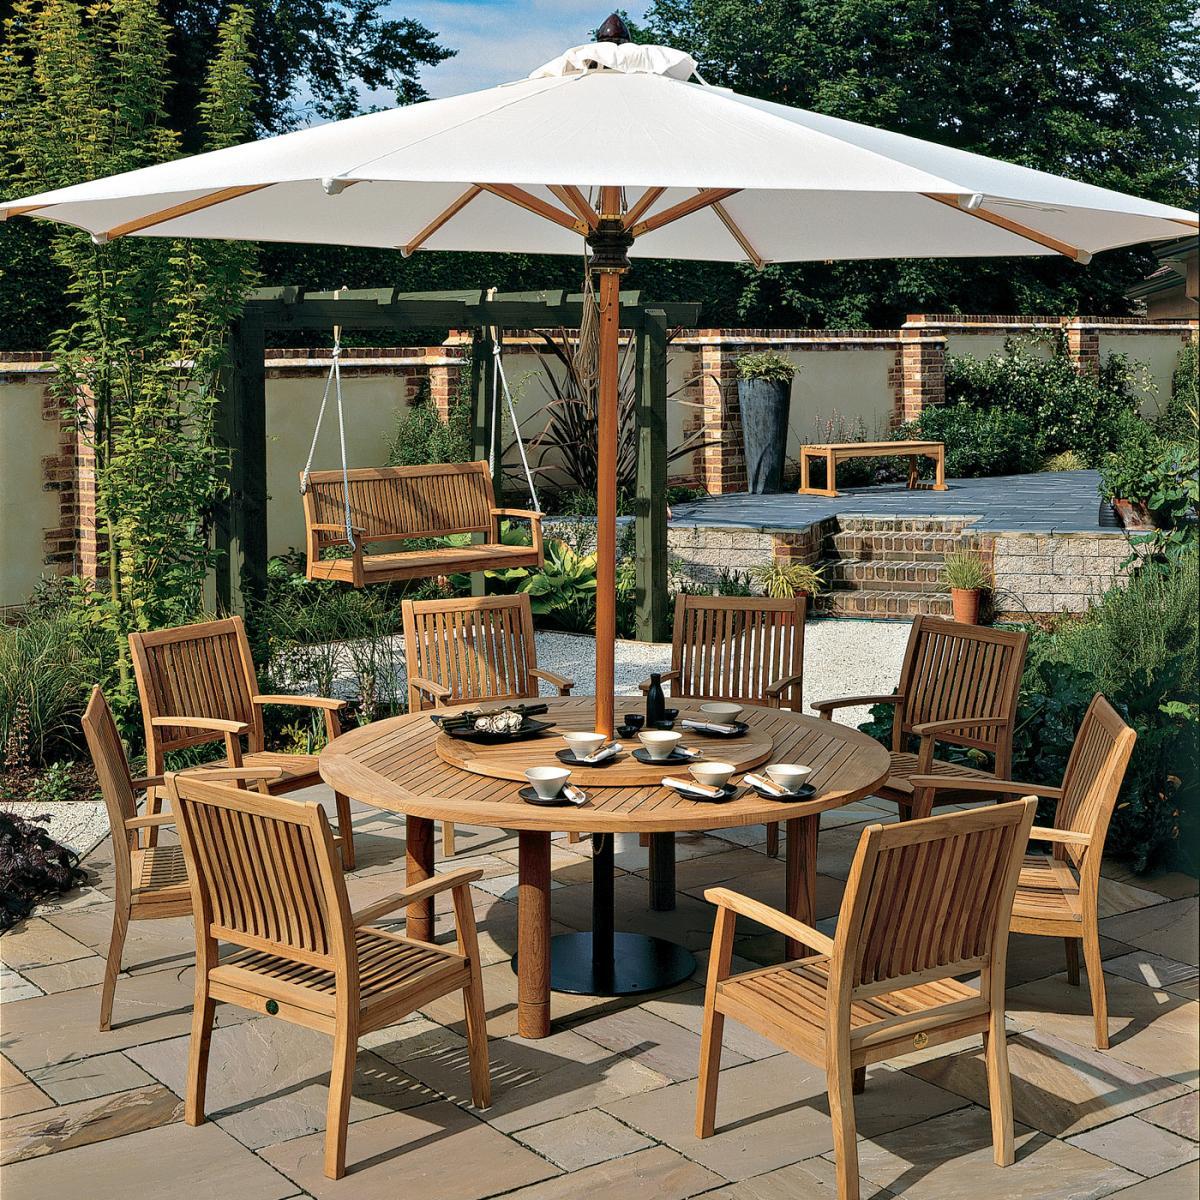 garden furniture  clifton nurseries - clifton nurseries barlow tyrie monaco  seater teak garden dining set